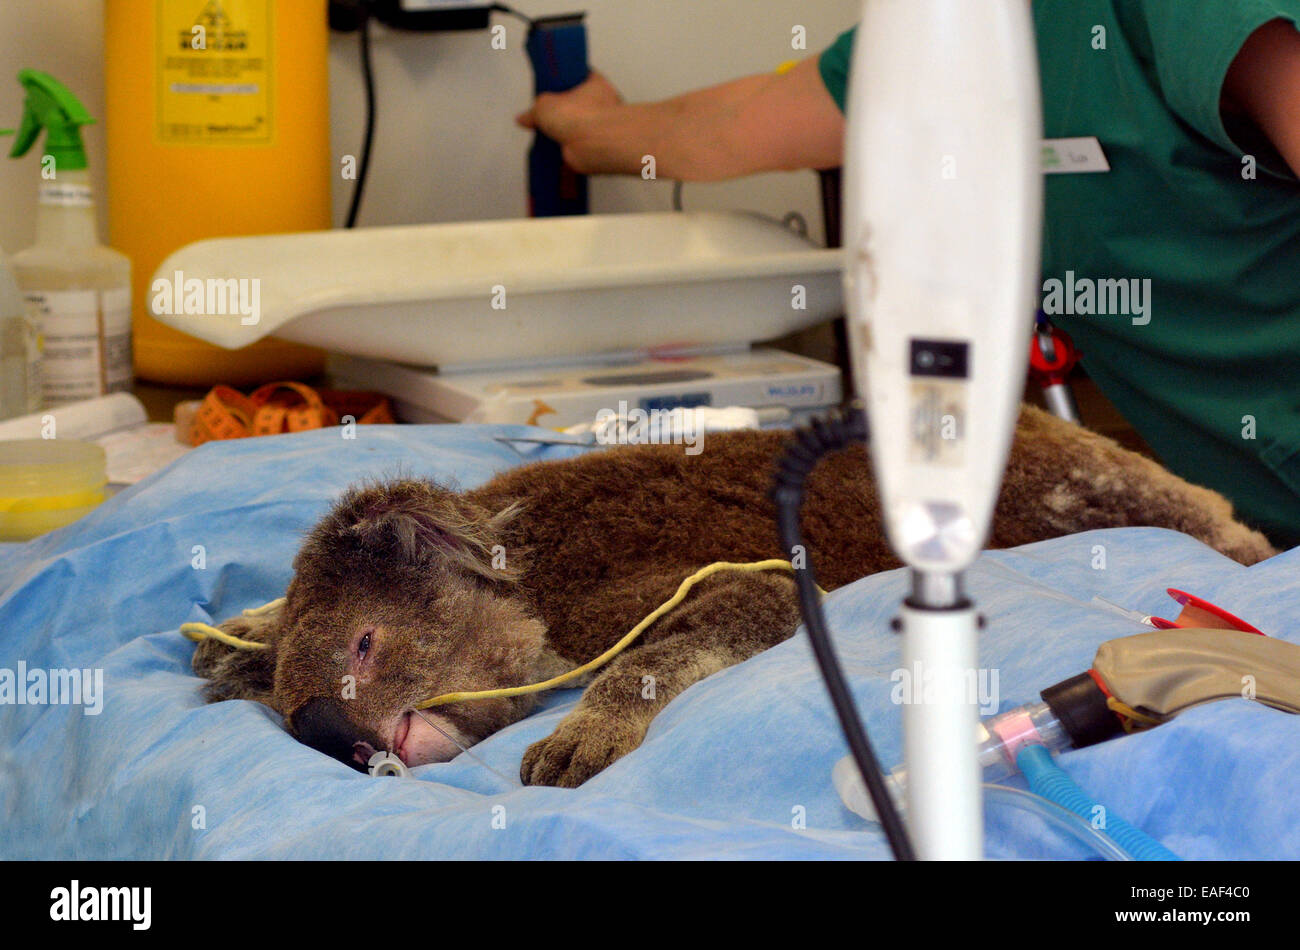 GOLD COAST, AUS - NOV 04 2014:Injured Koala patient in Currumbin Wildlife Sanctuary Hospital.The wildlife hospital - Stock Image